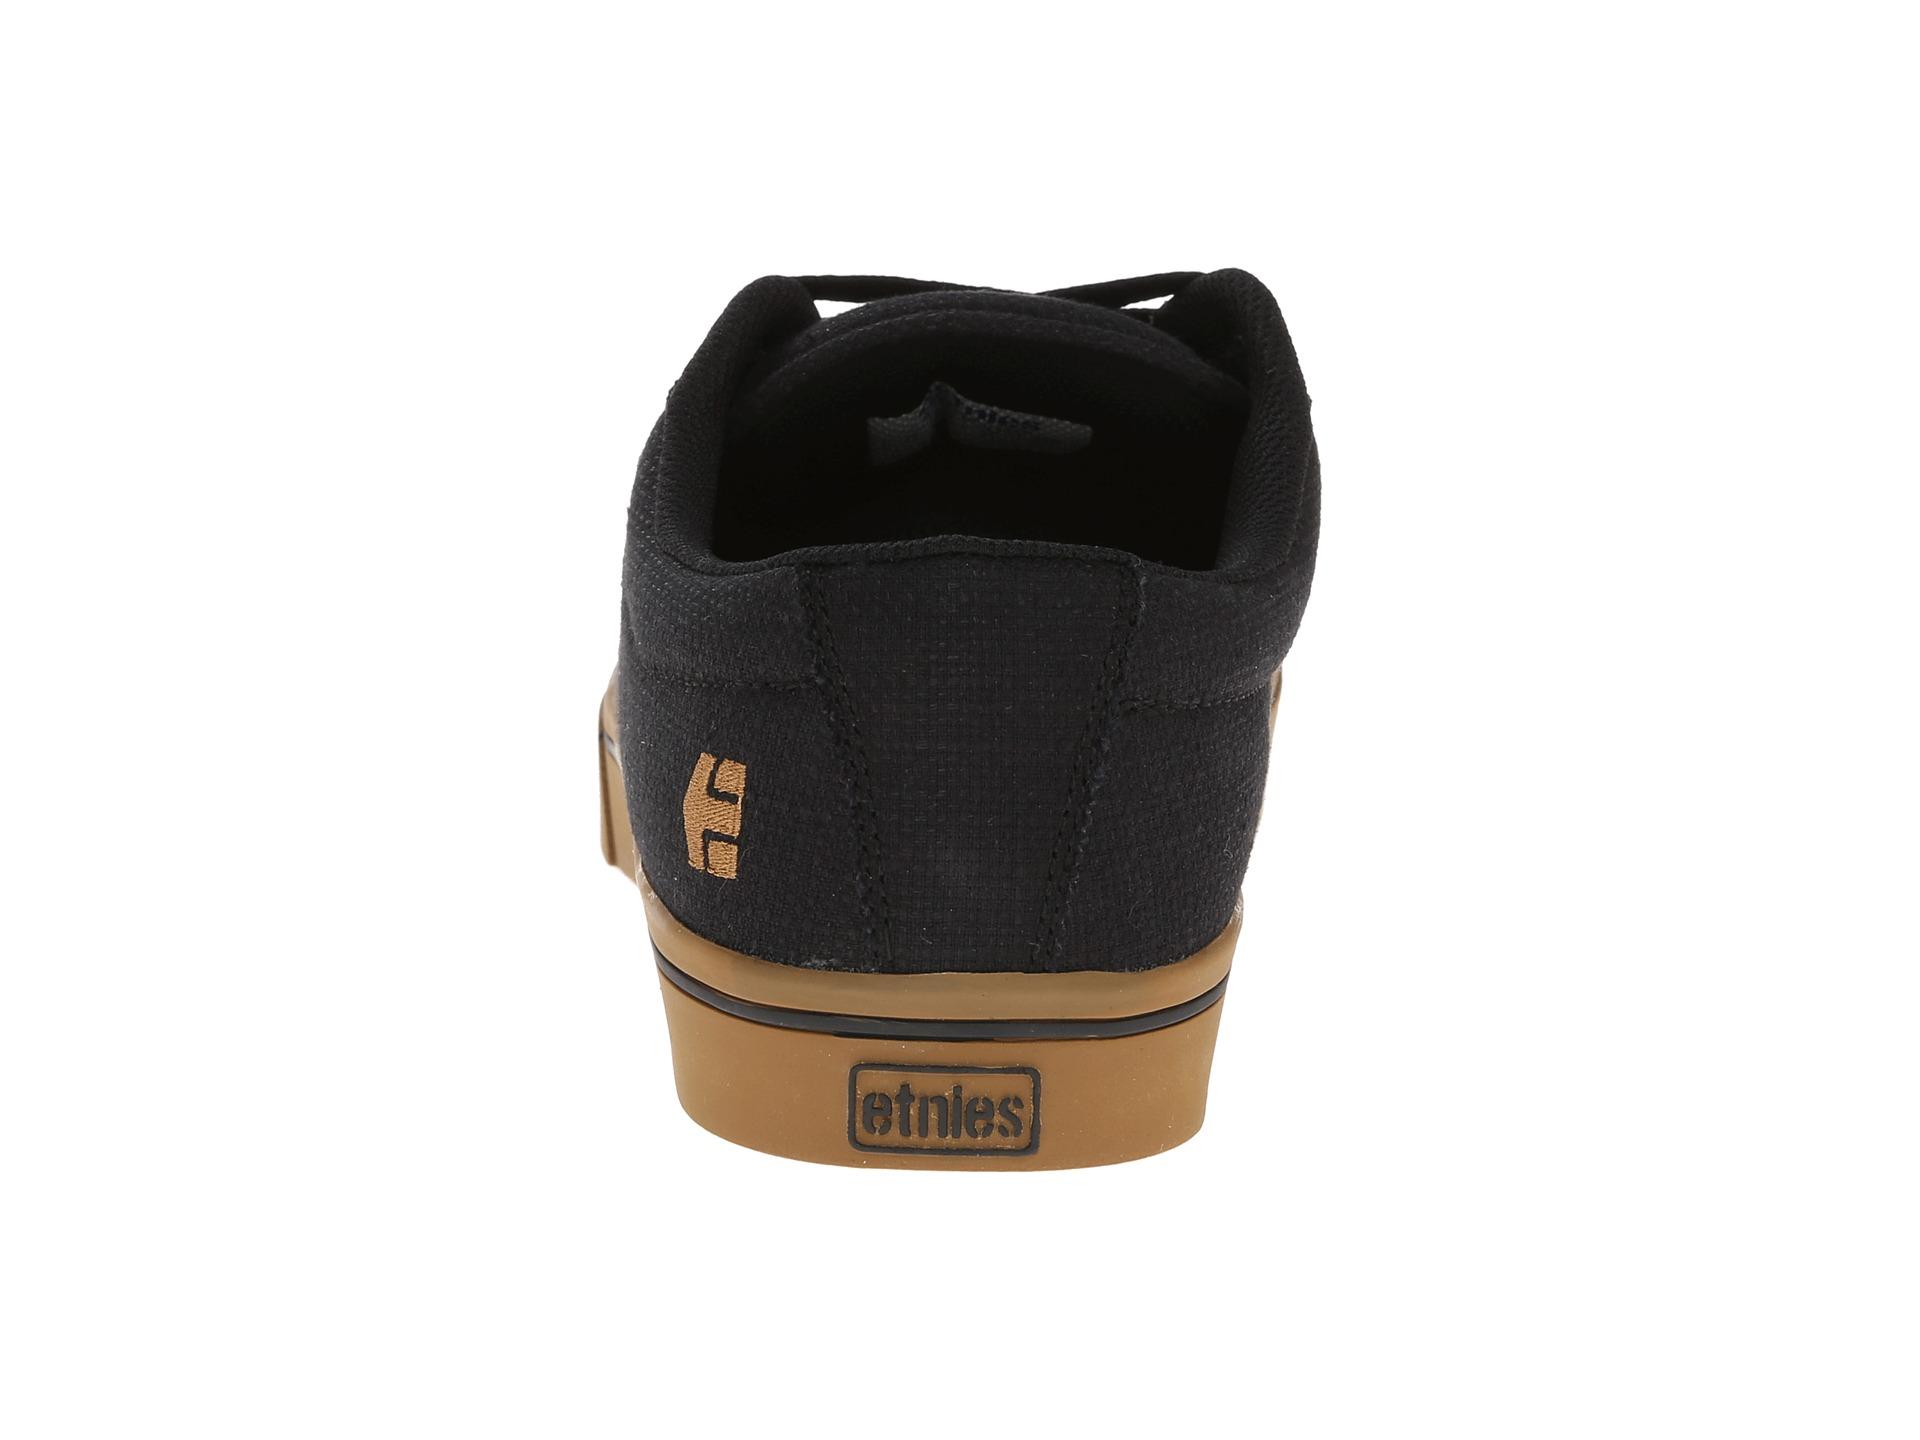 Etnies Skate Shoes For Men Images Globe